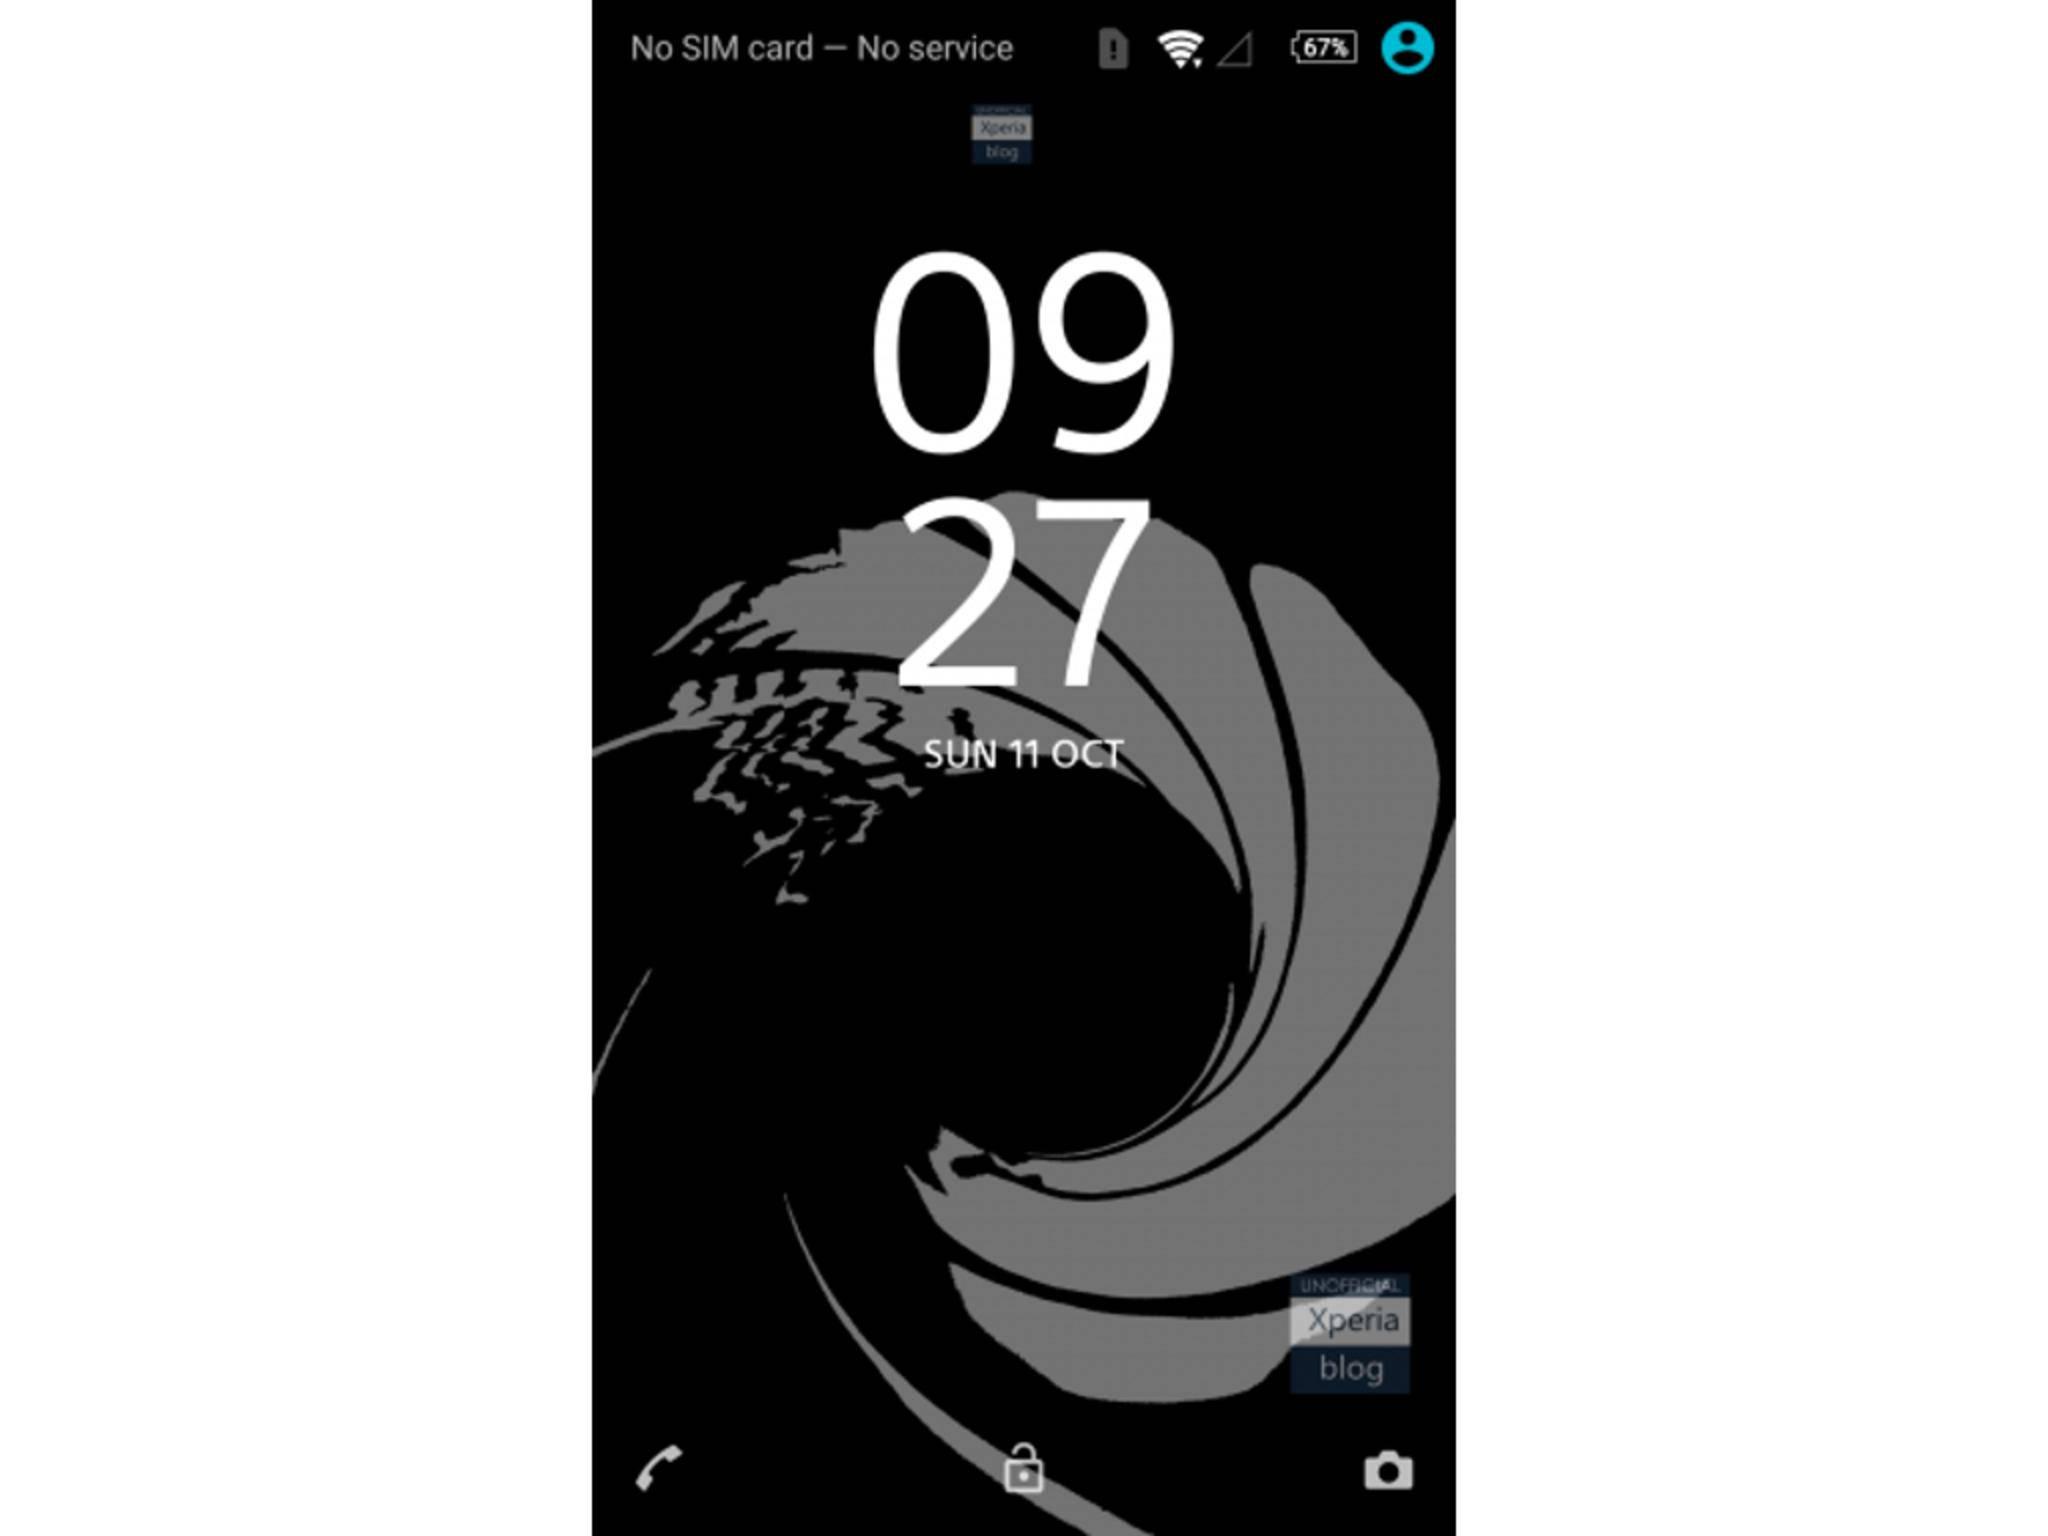 So sieht das Bond-Theme fürs Sony Xperia Z5 aus.